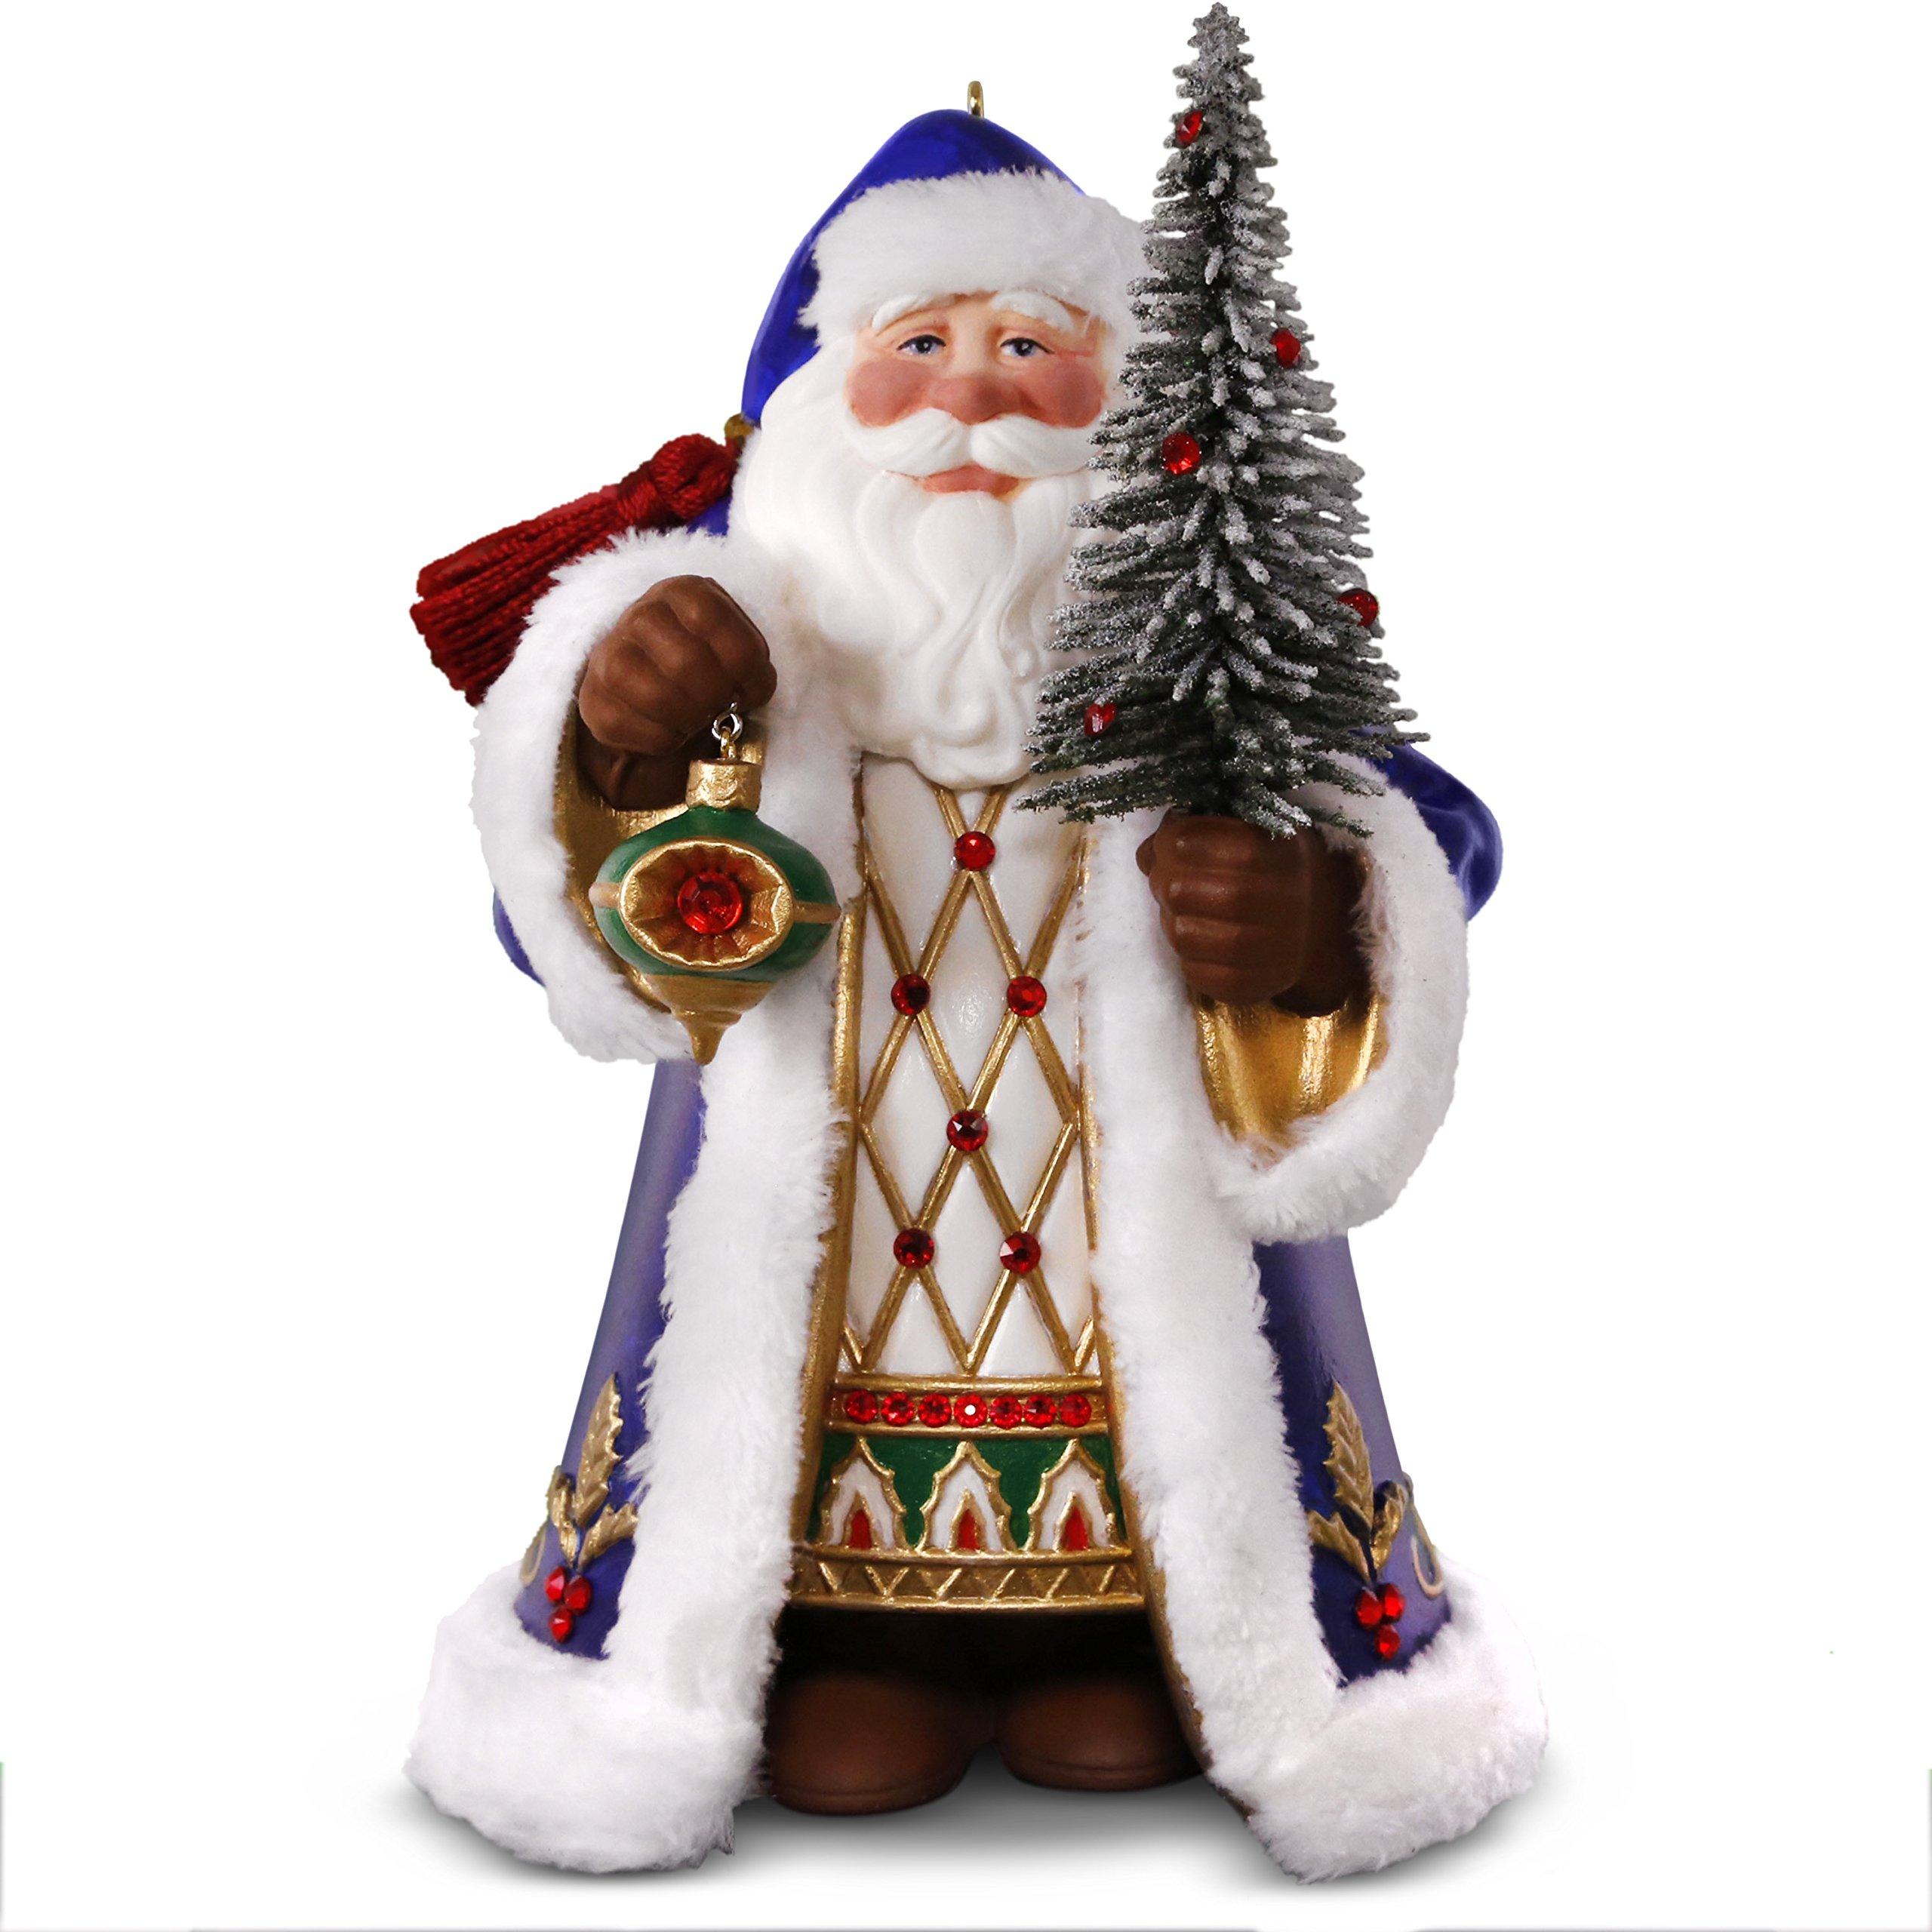 Hallmark Keepsake Christmas Ornament 2018 Year Dated, Old World Santa, Porcelain